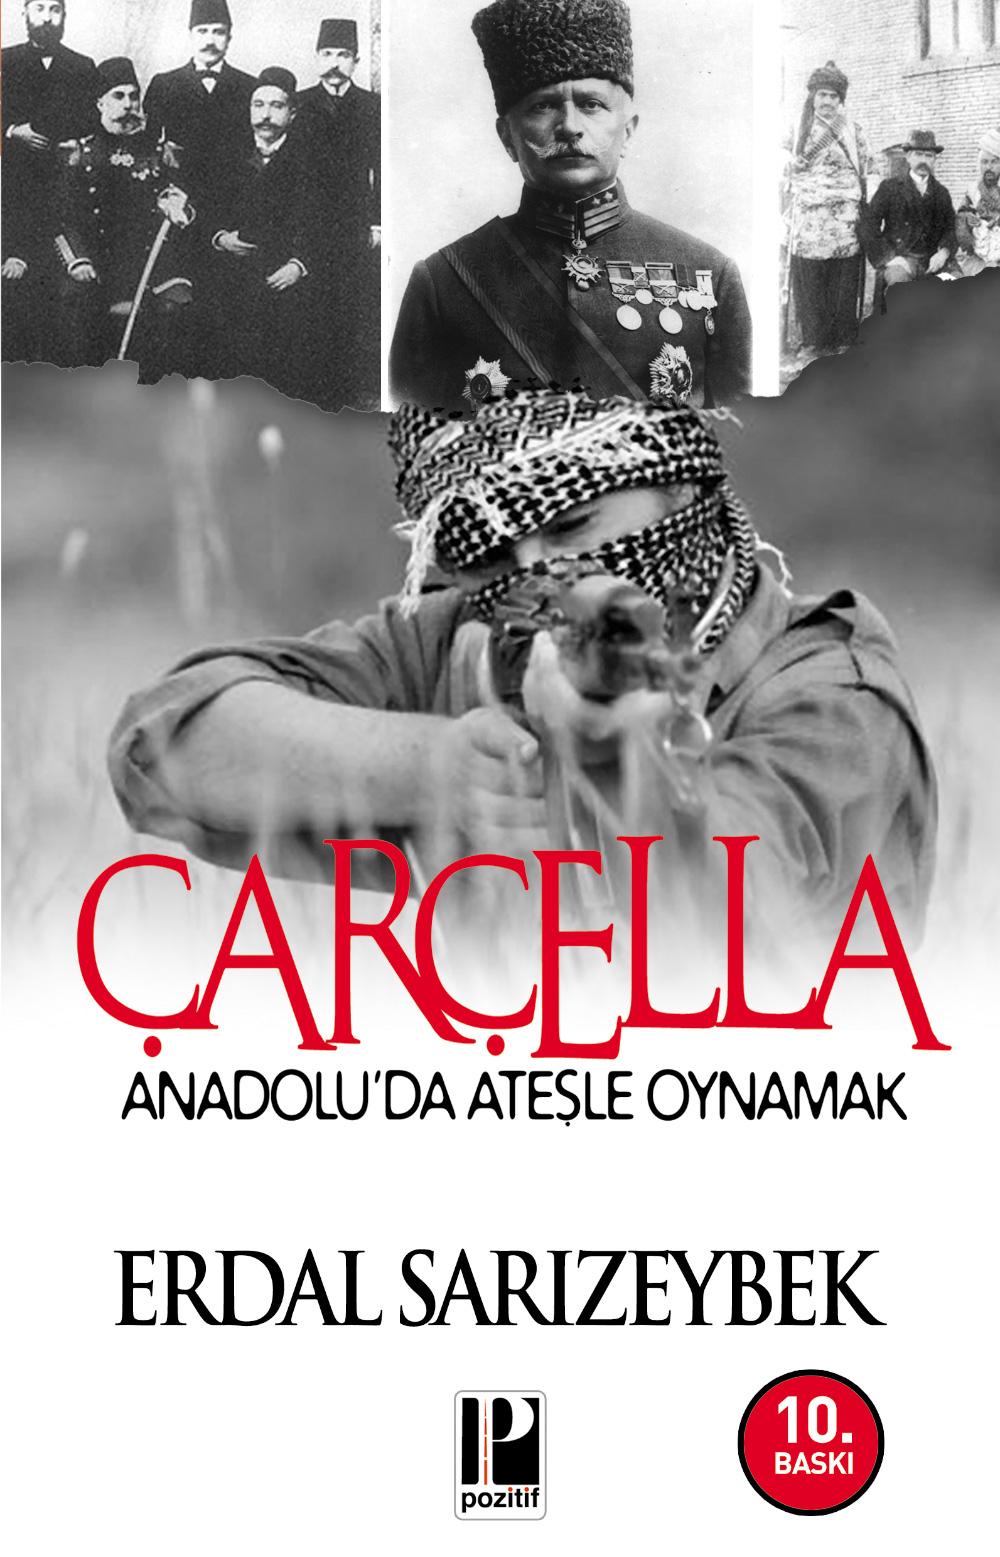 Çarçella Anadolu